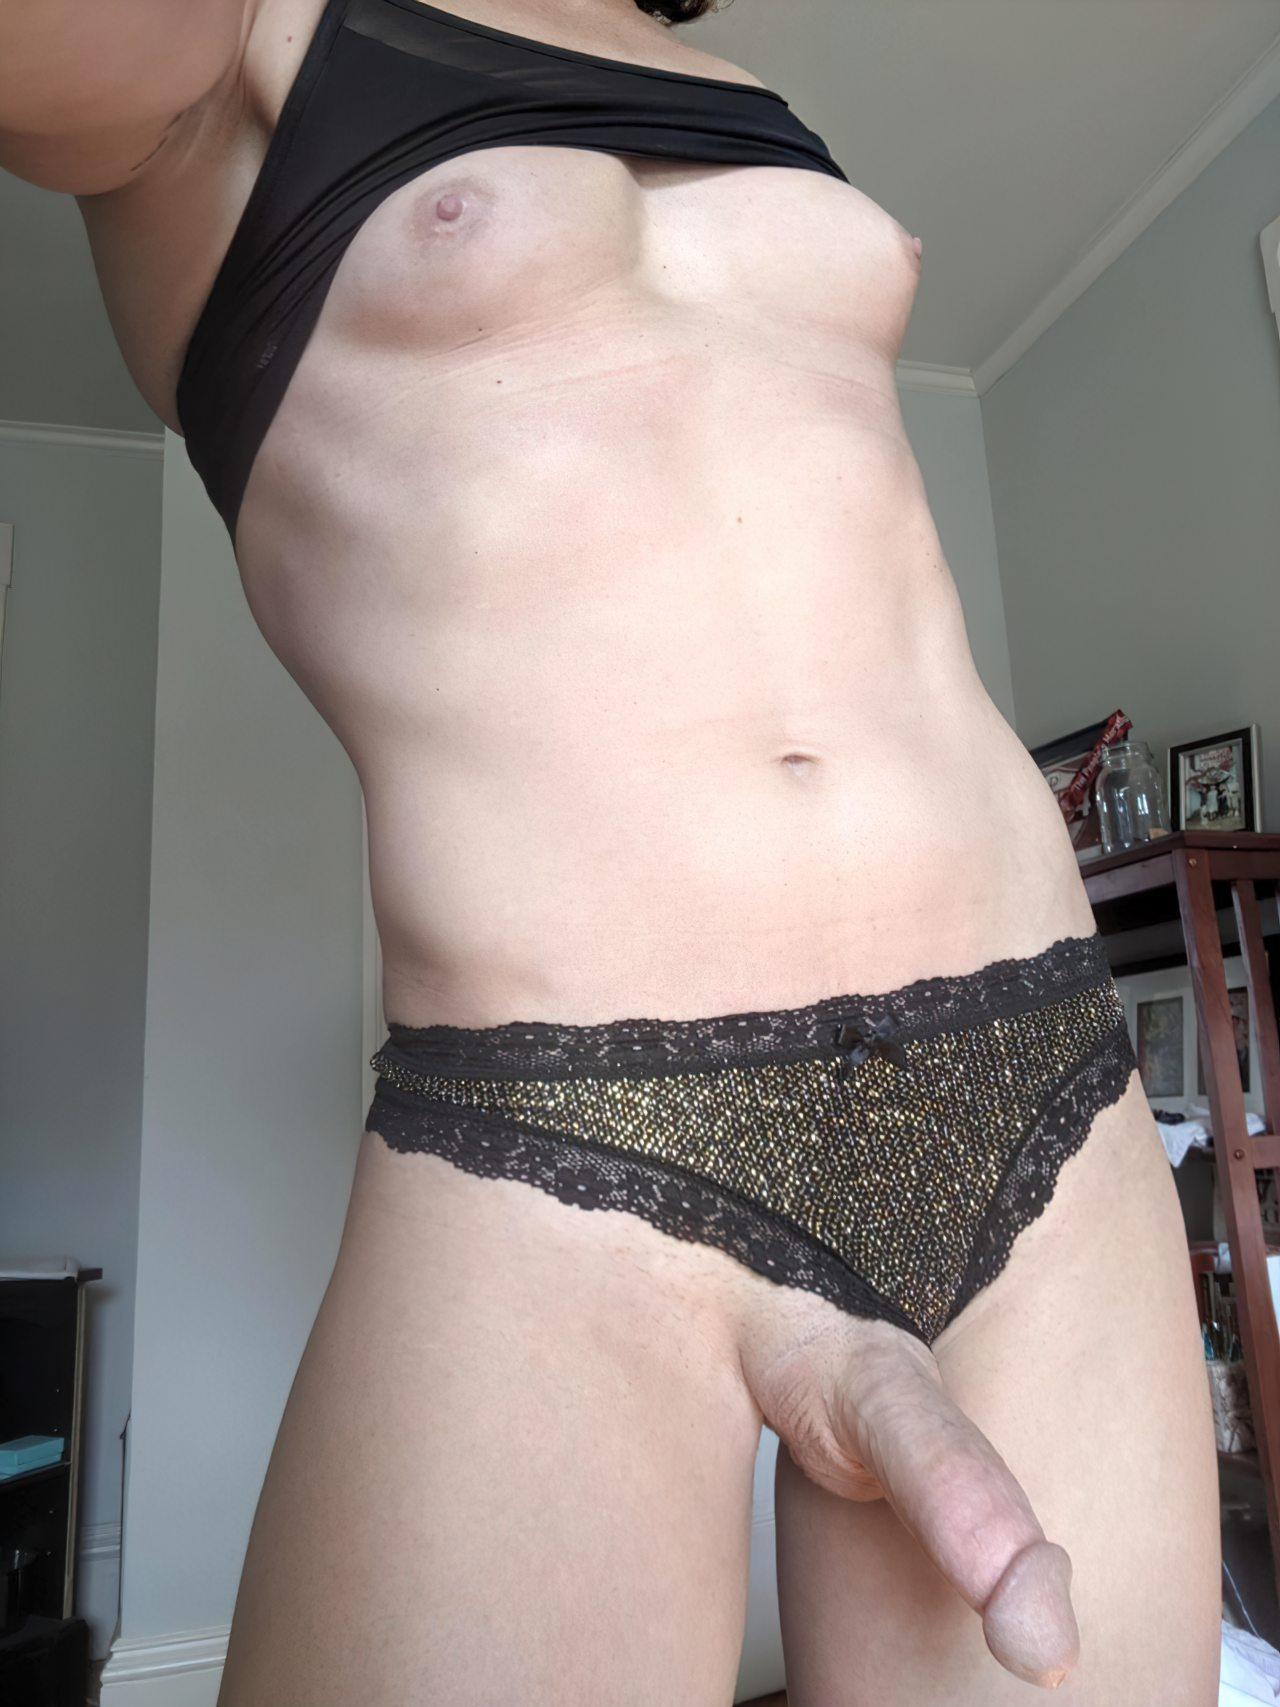 Nudes Transexual Amadora (18)